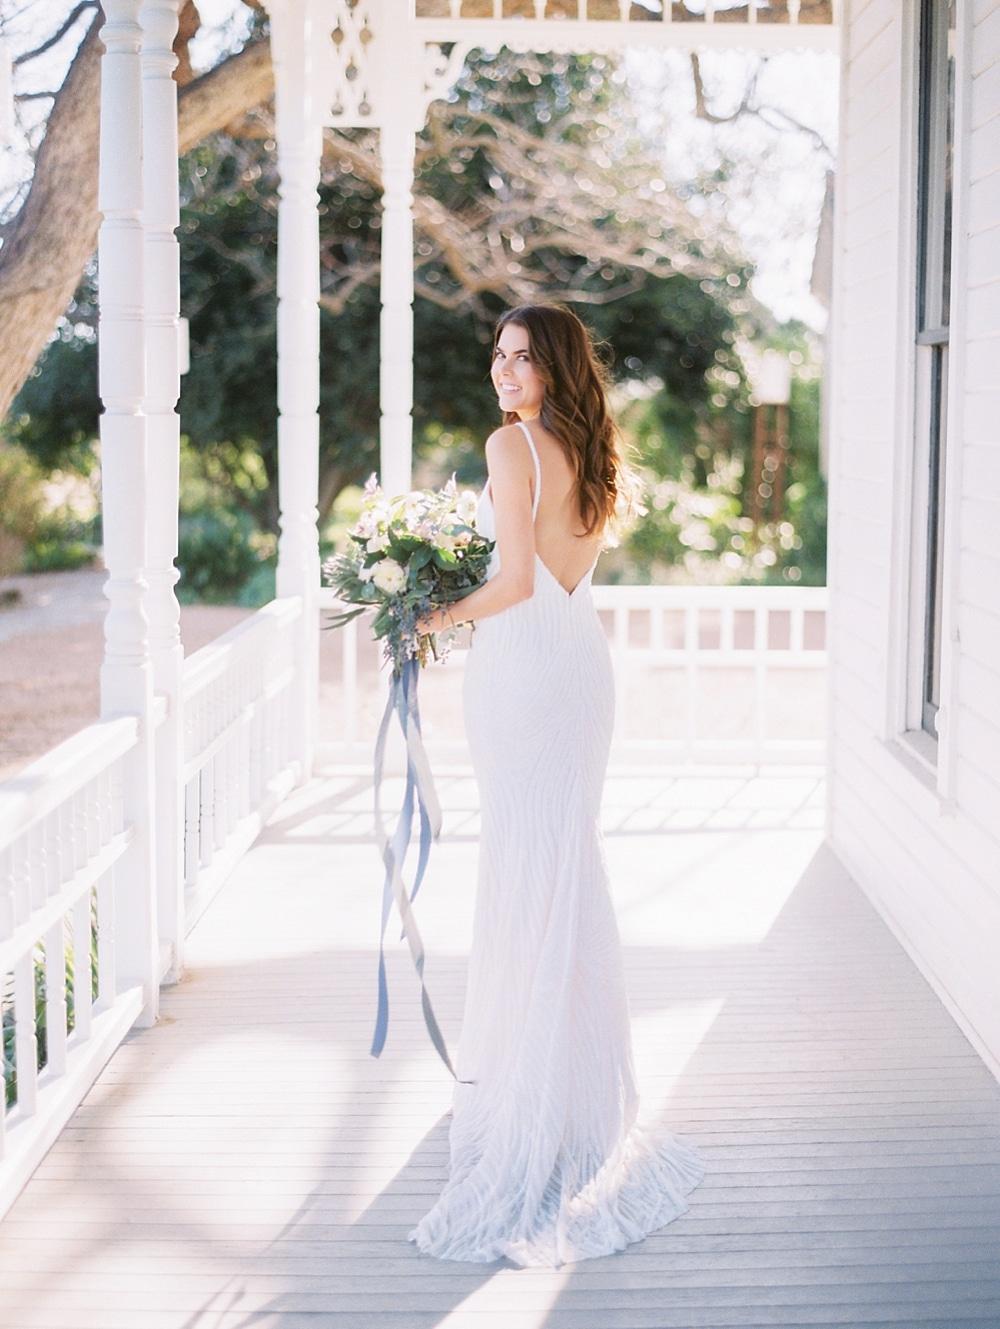 Kristin-La-Voie-Photography-Austin-Wedding-Photographer-barr-mansion (11 of 86)